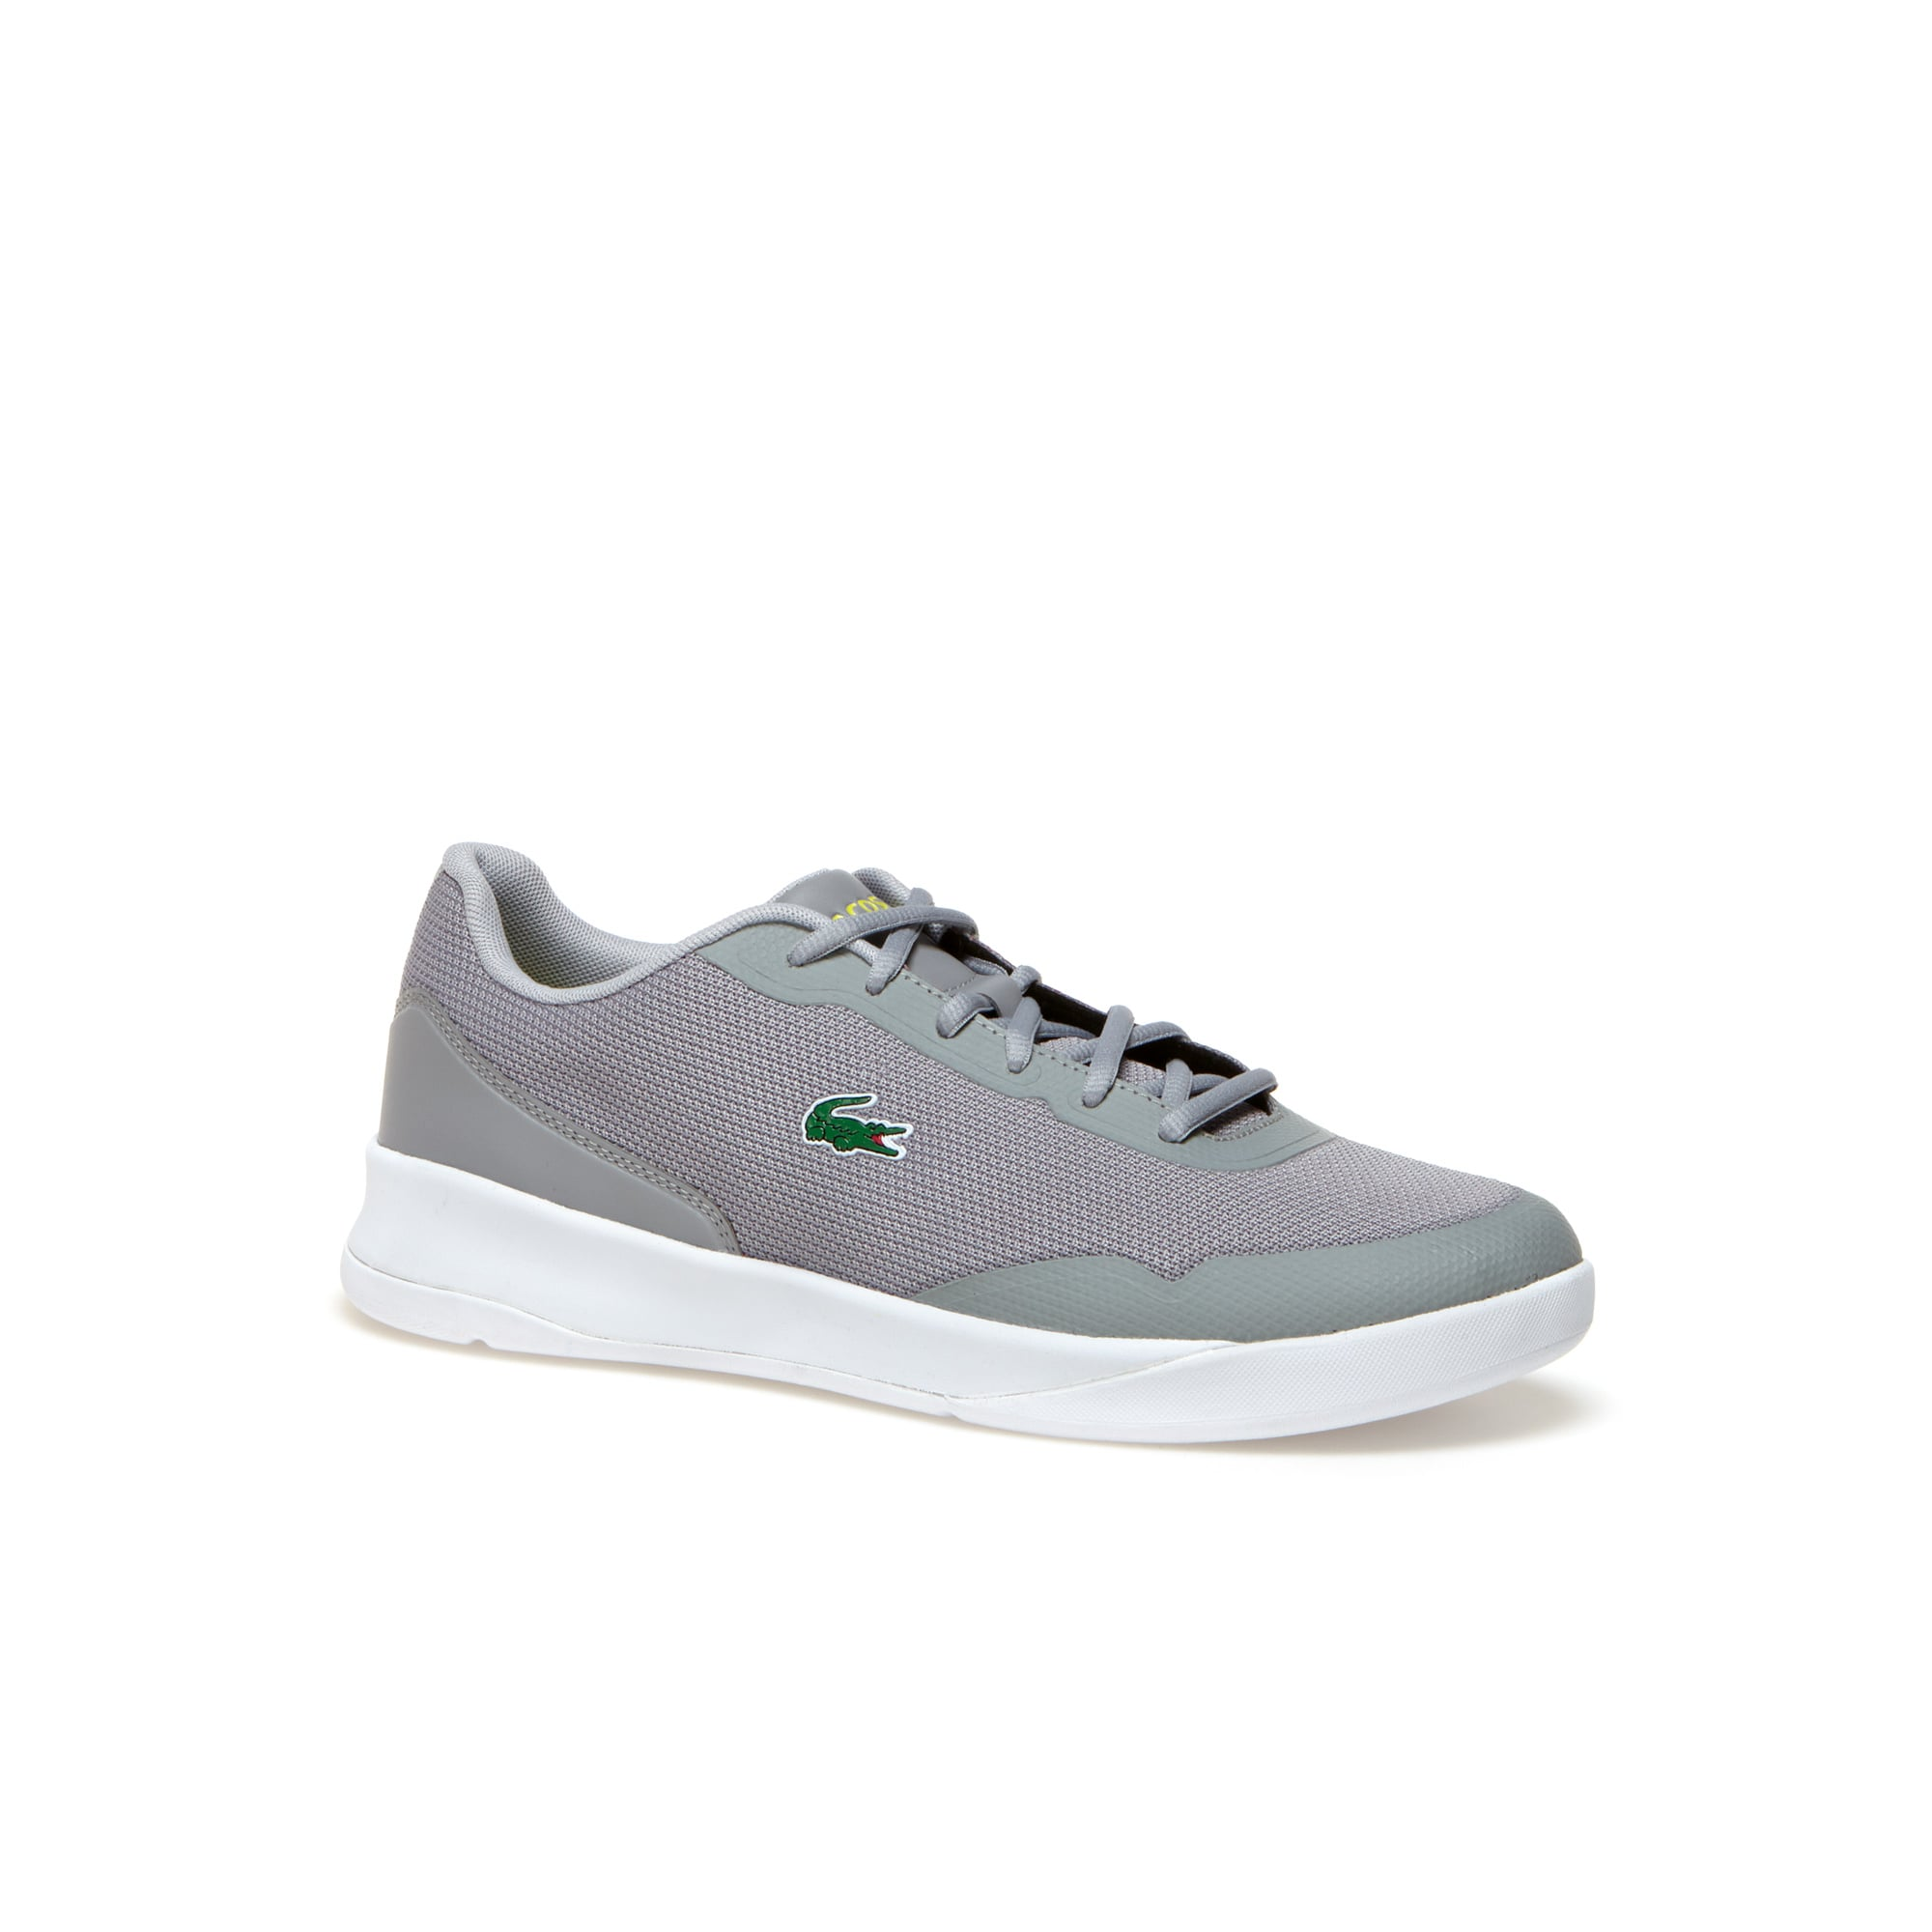 Men's LT Spirit Piqué Canvas Sneakers